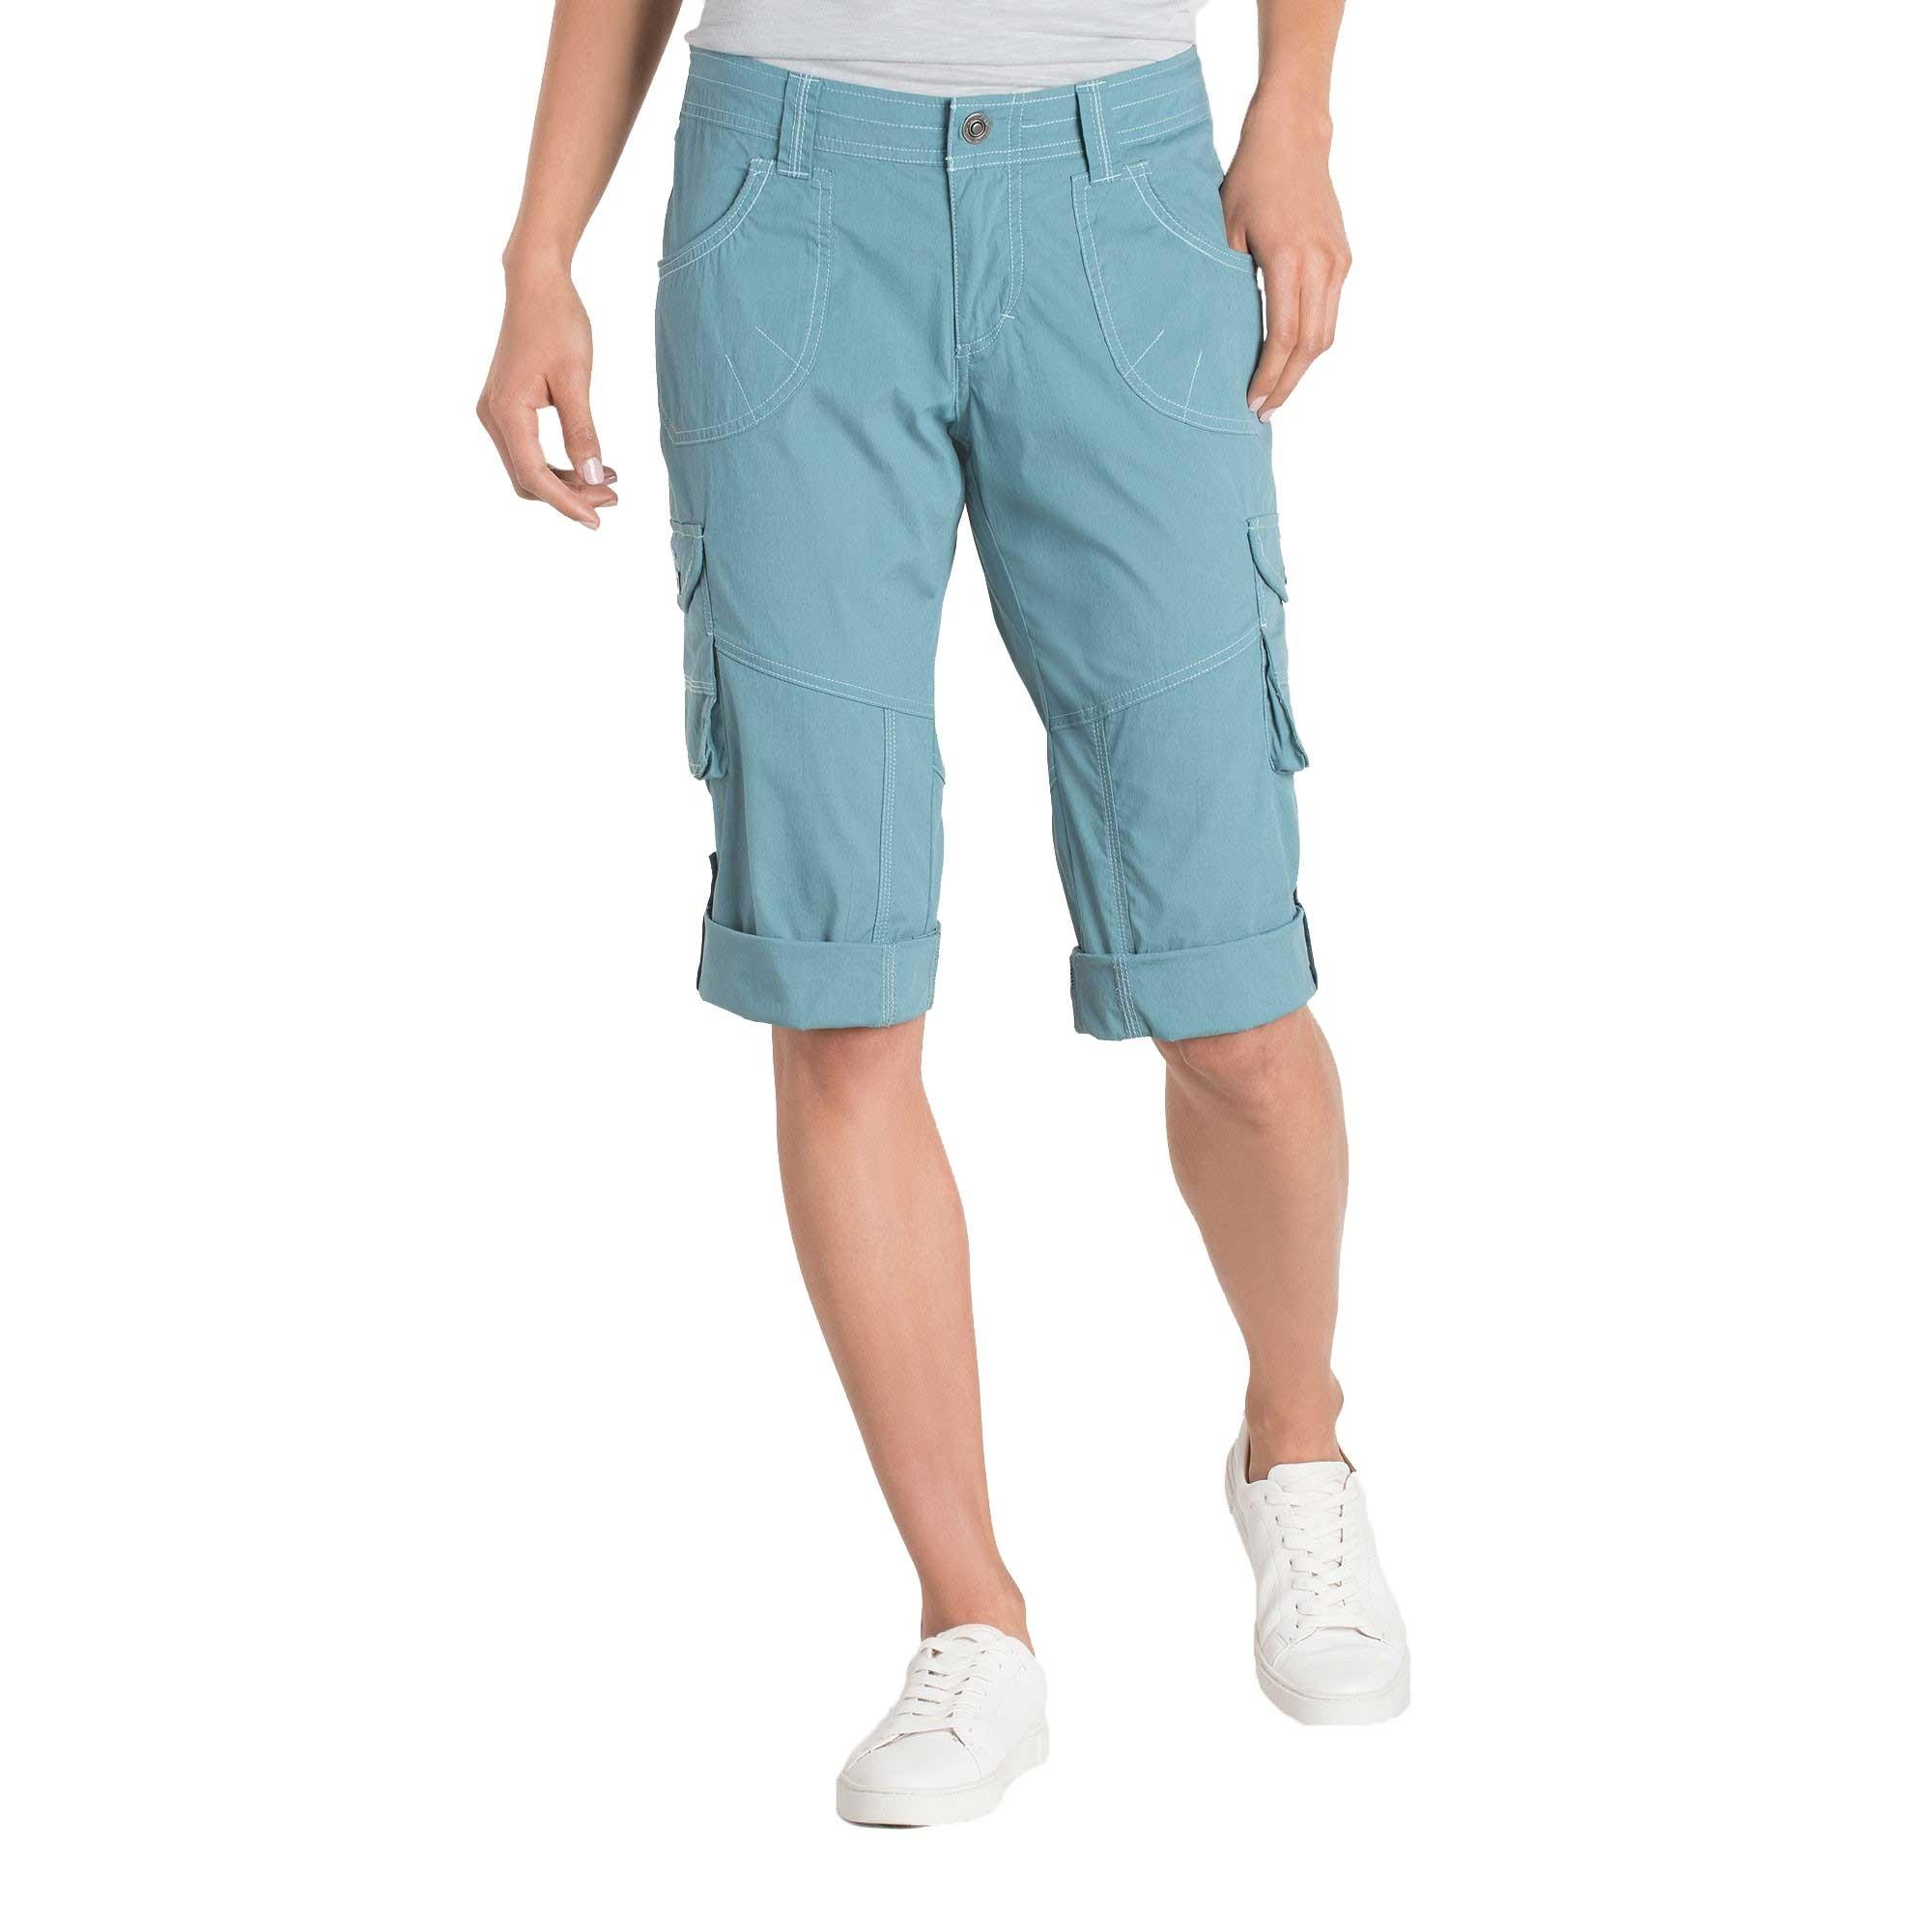 Kuhl Kontra Women's Shorts - Blue Grass